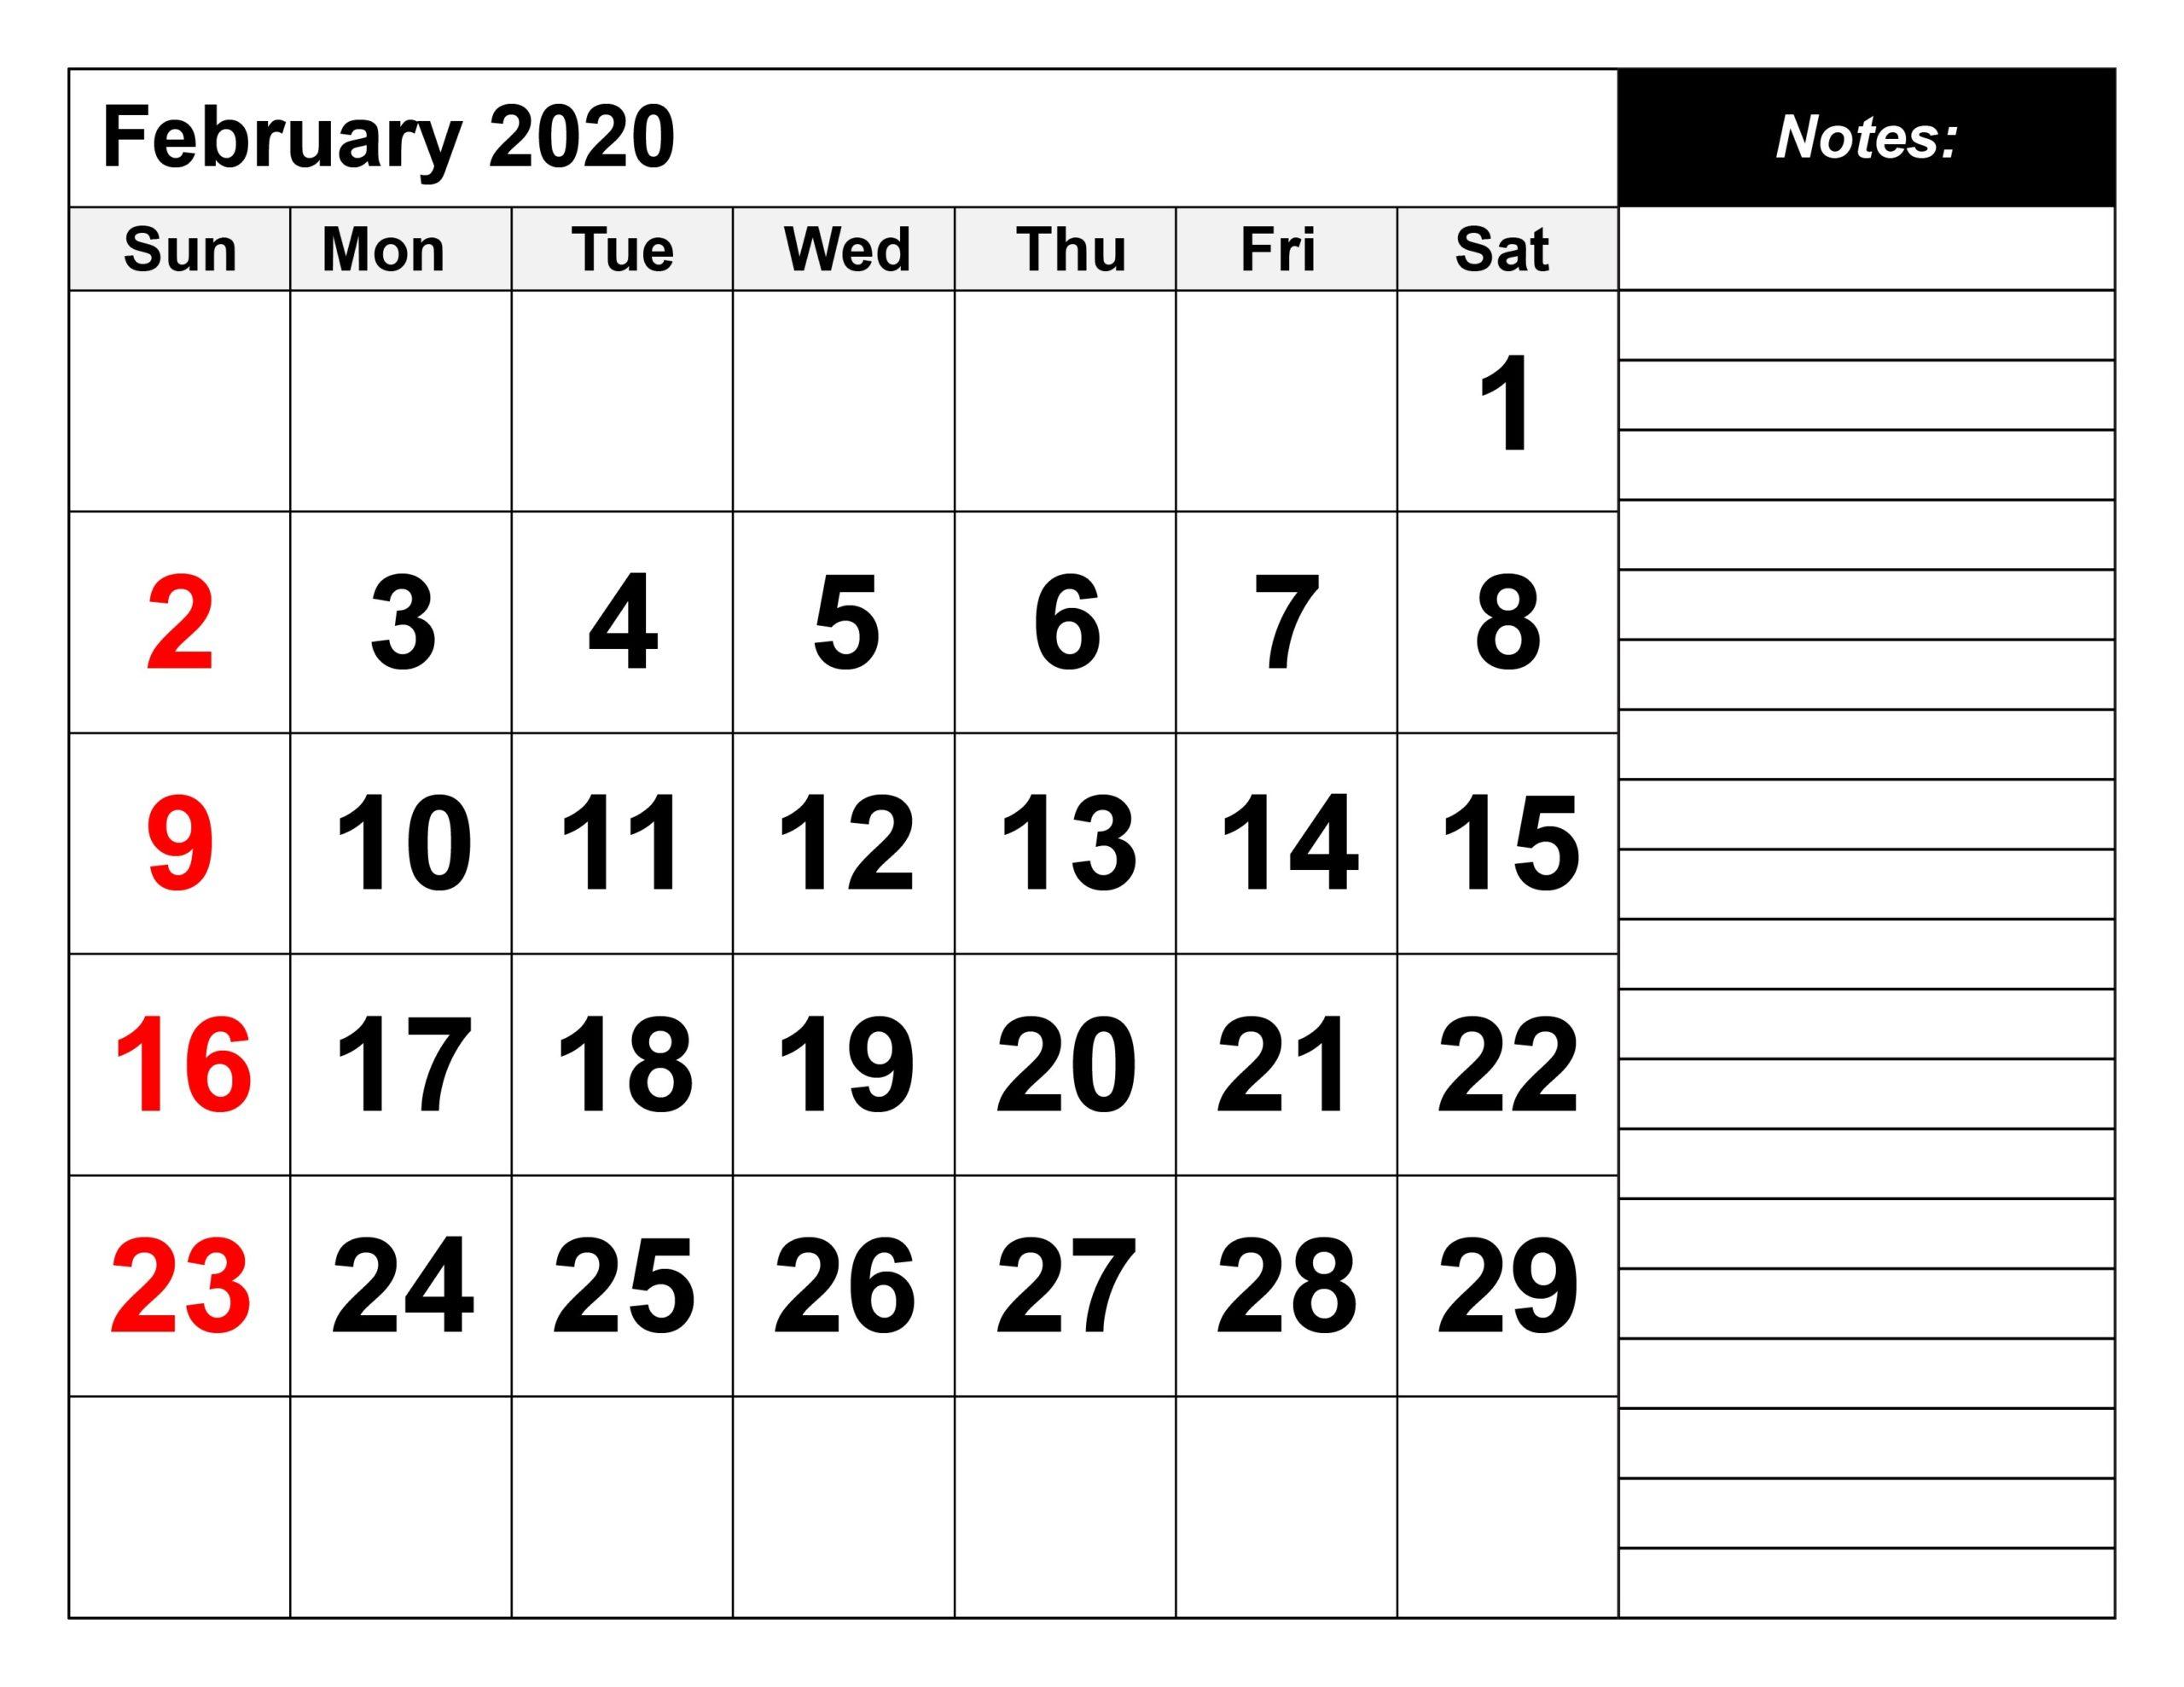 February 2020 Blank Calendar Wallpaper